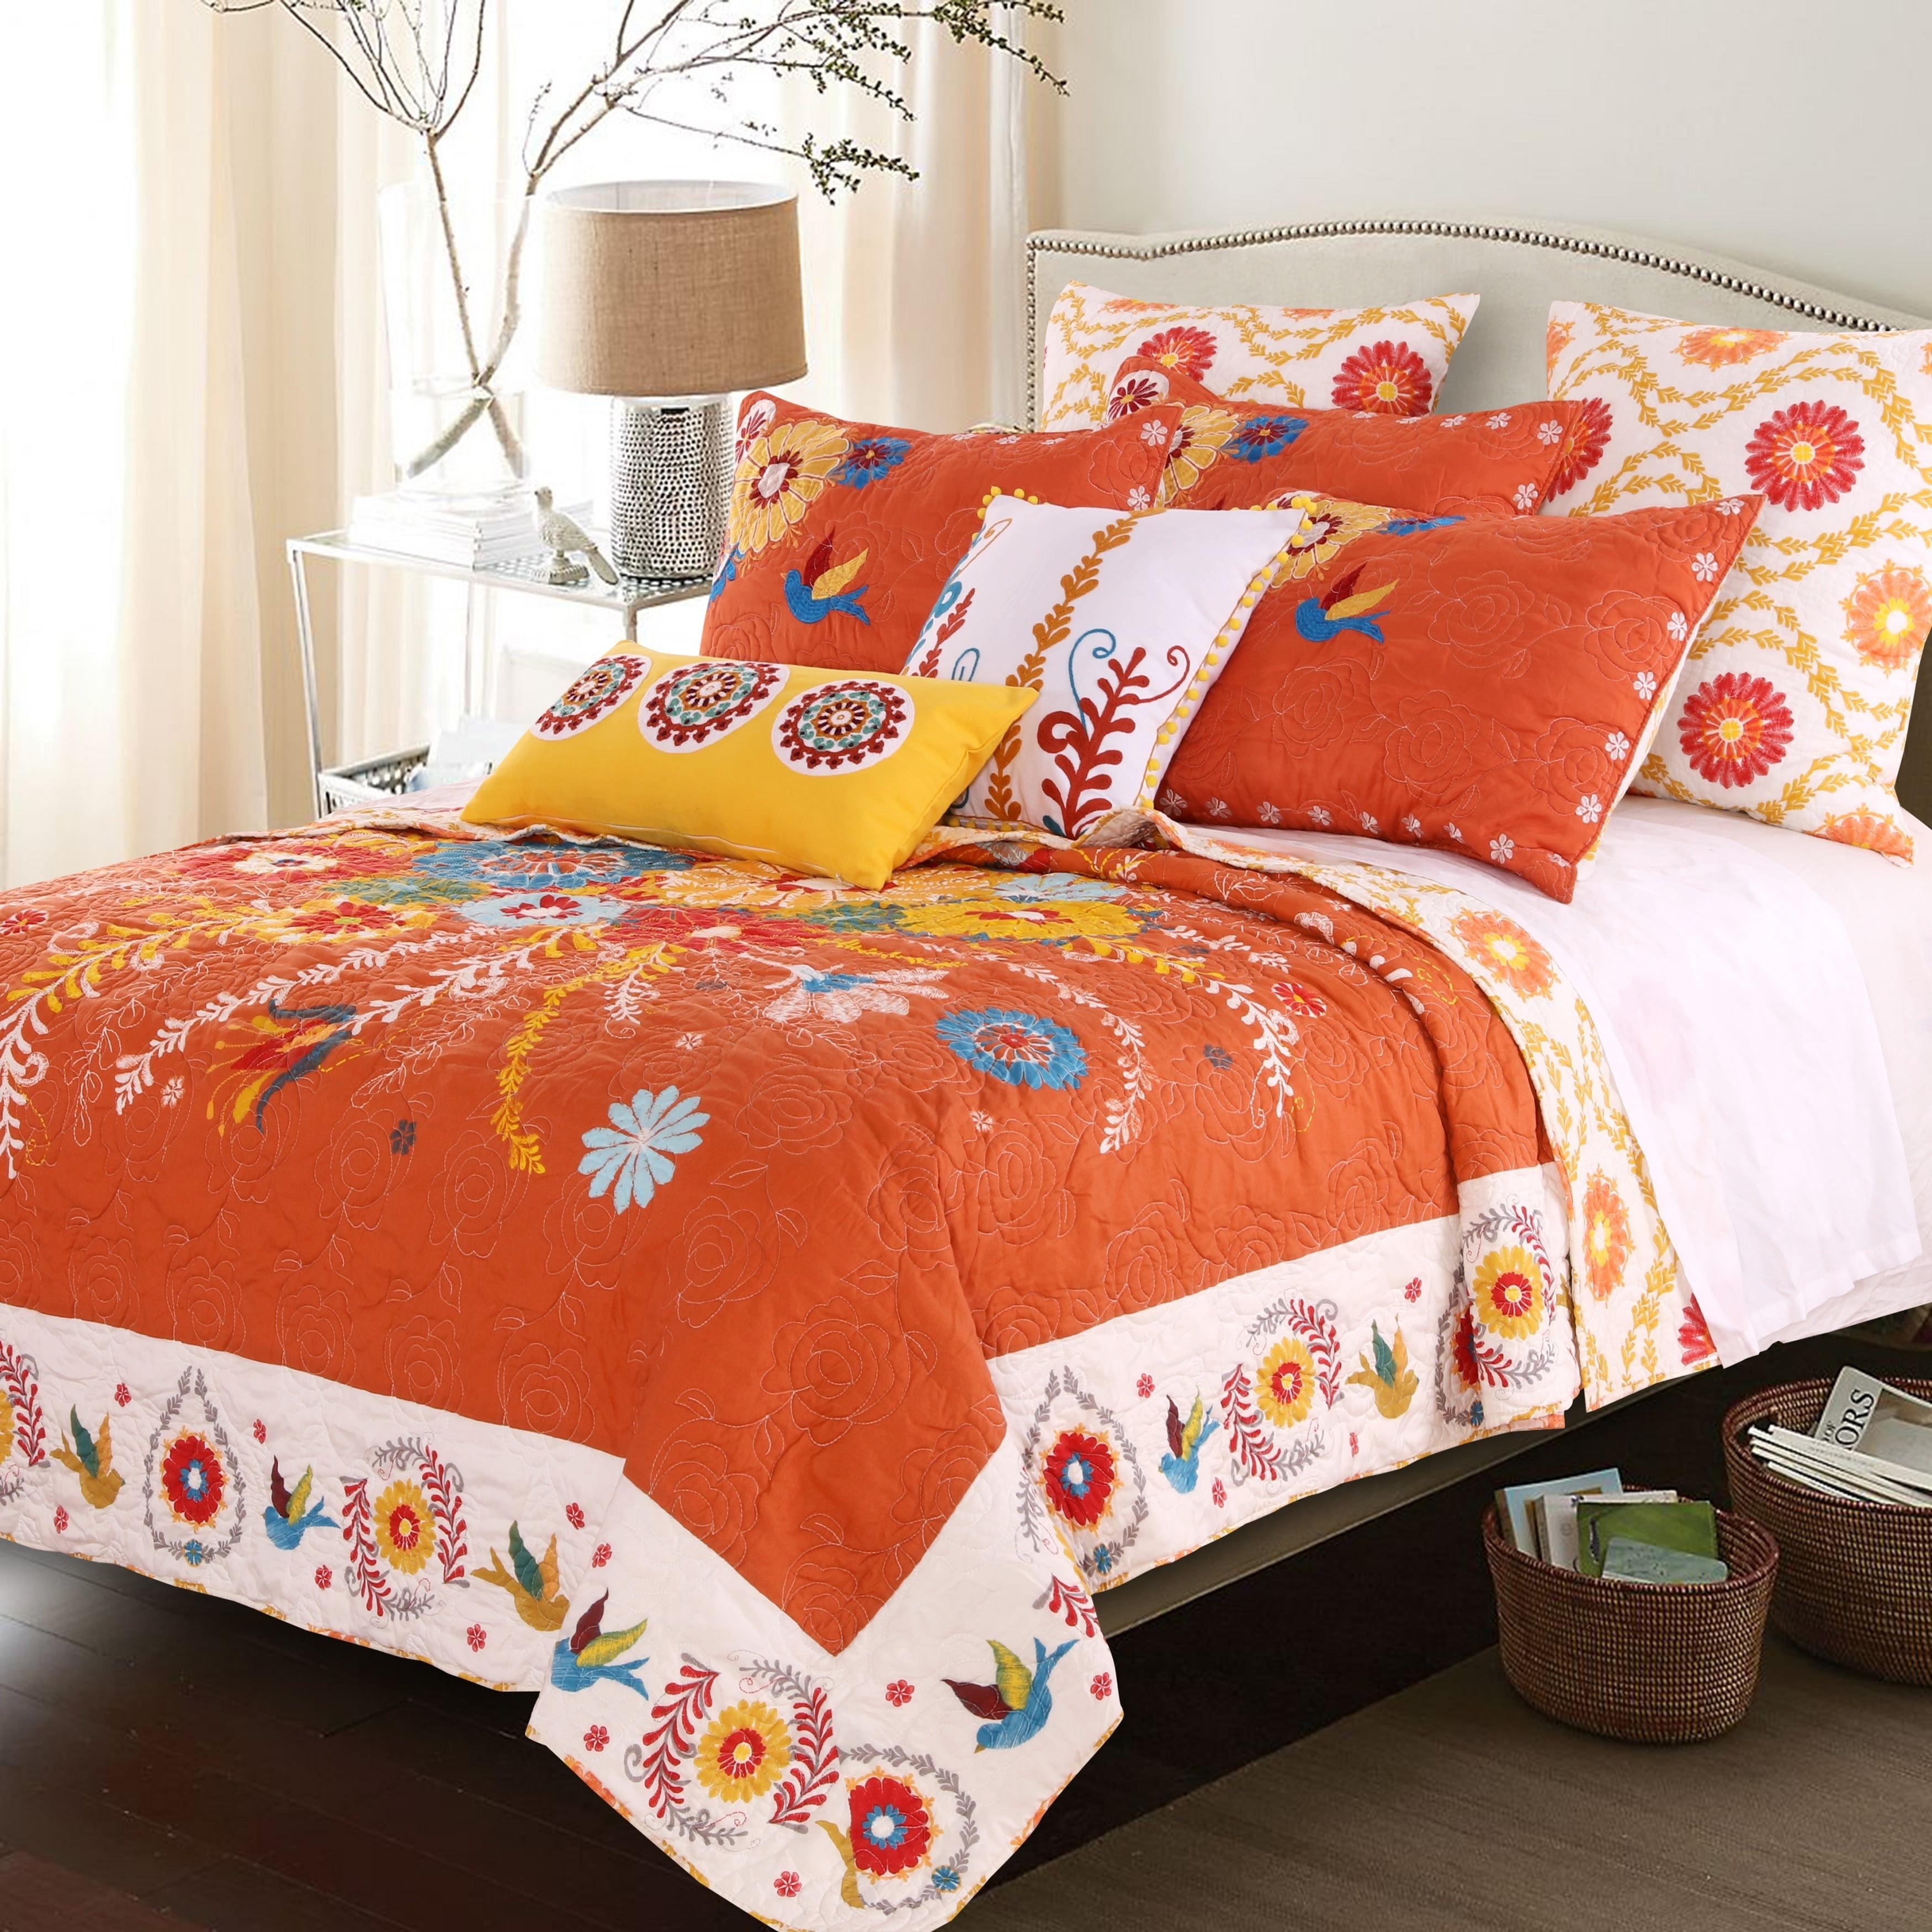 Barefoot Bungalow Topanga Bohemian Floral Orange Quilt Set Walmart Com Walmart Com